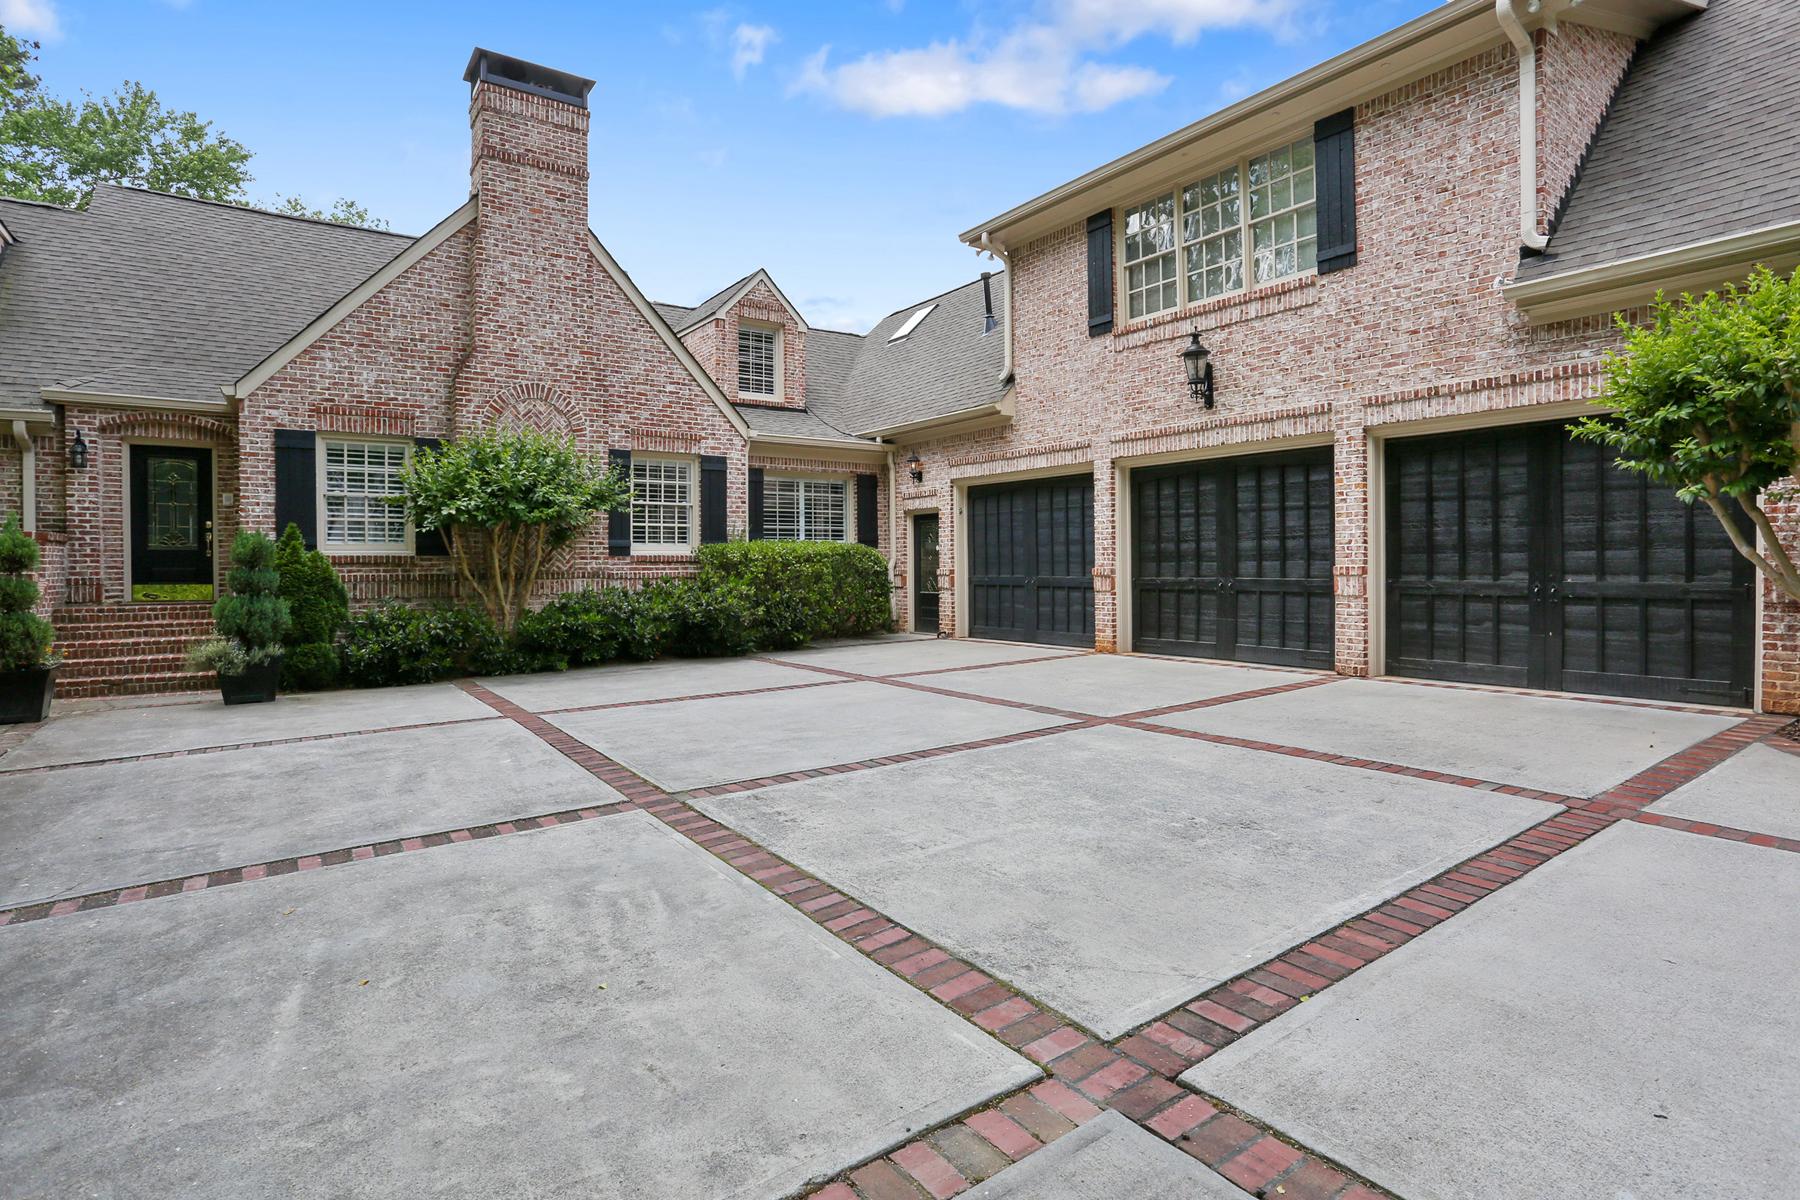 Single Family Home for Sale at Stunning Brick Home 3930 Peachtree Dunwoody Road NE North Buckhead, Atlanta, Georgia 30342 United States